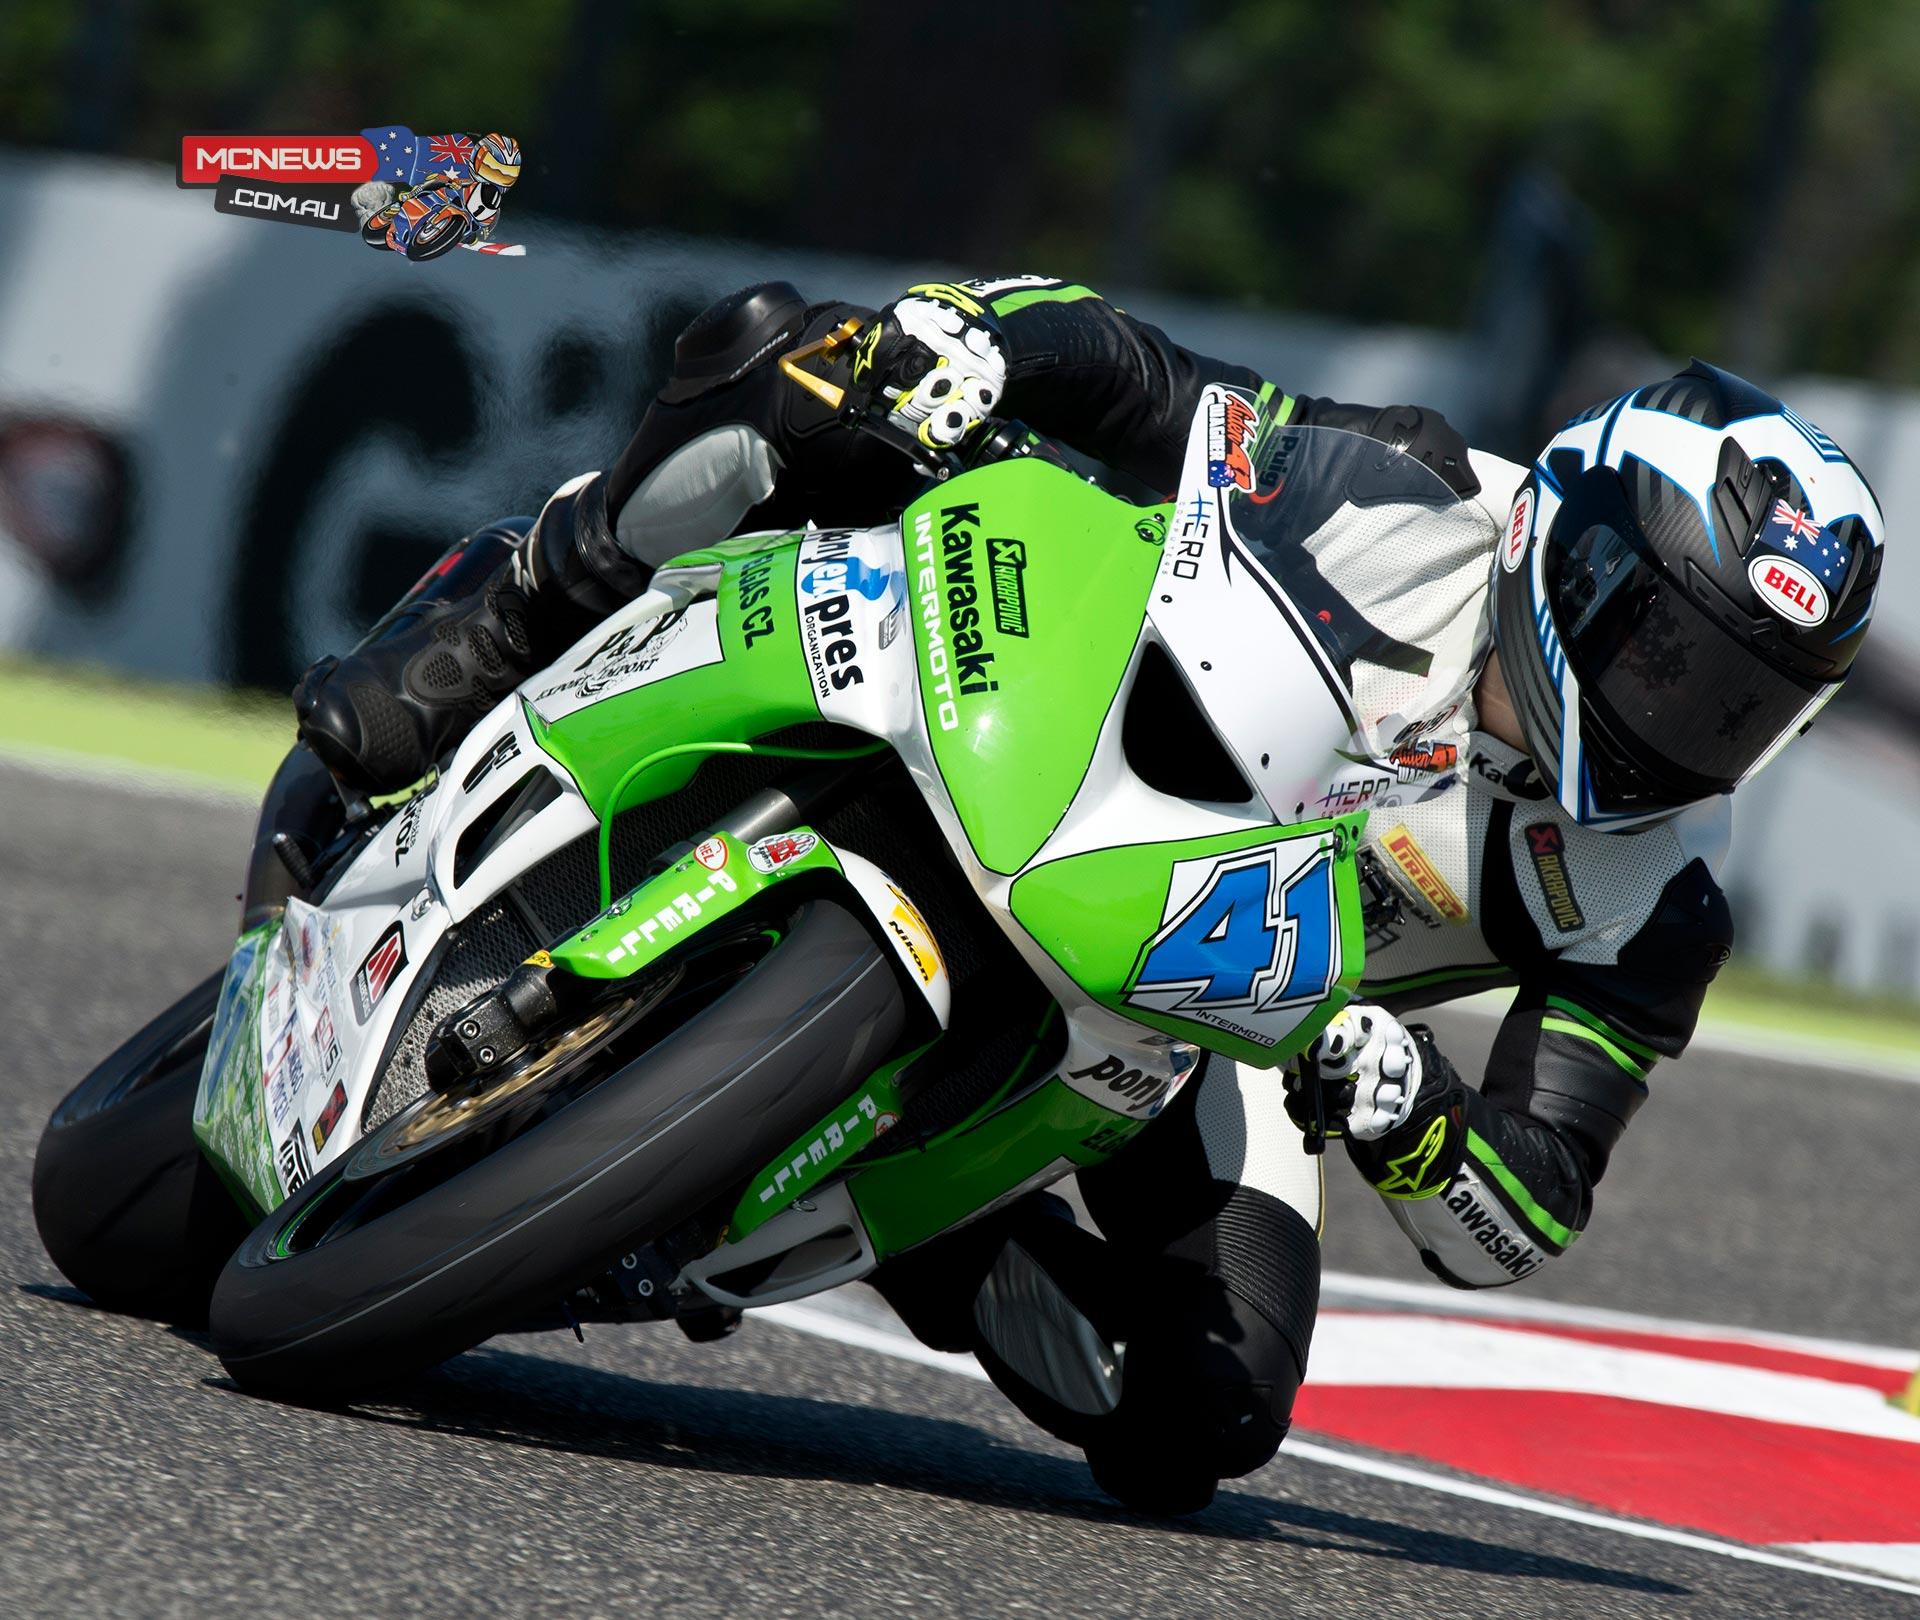 Aiden Wagner - Imola World Supersport 2015